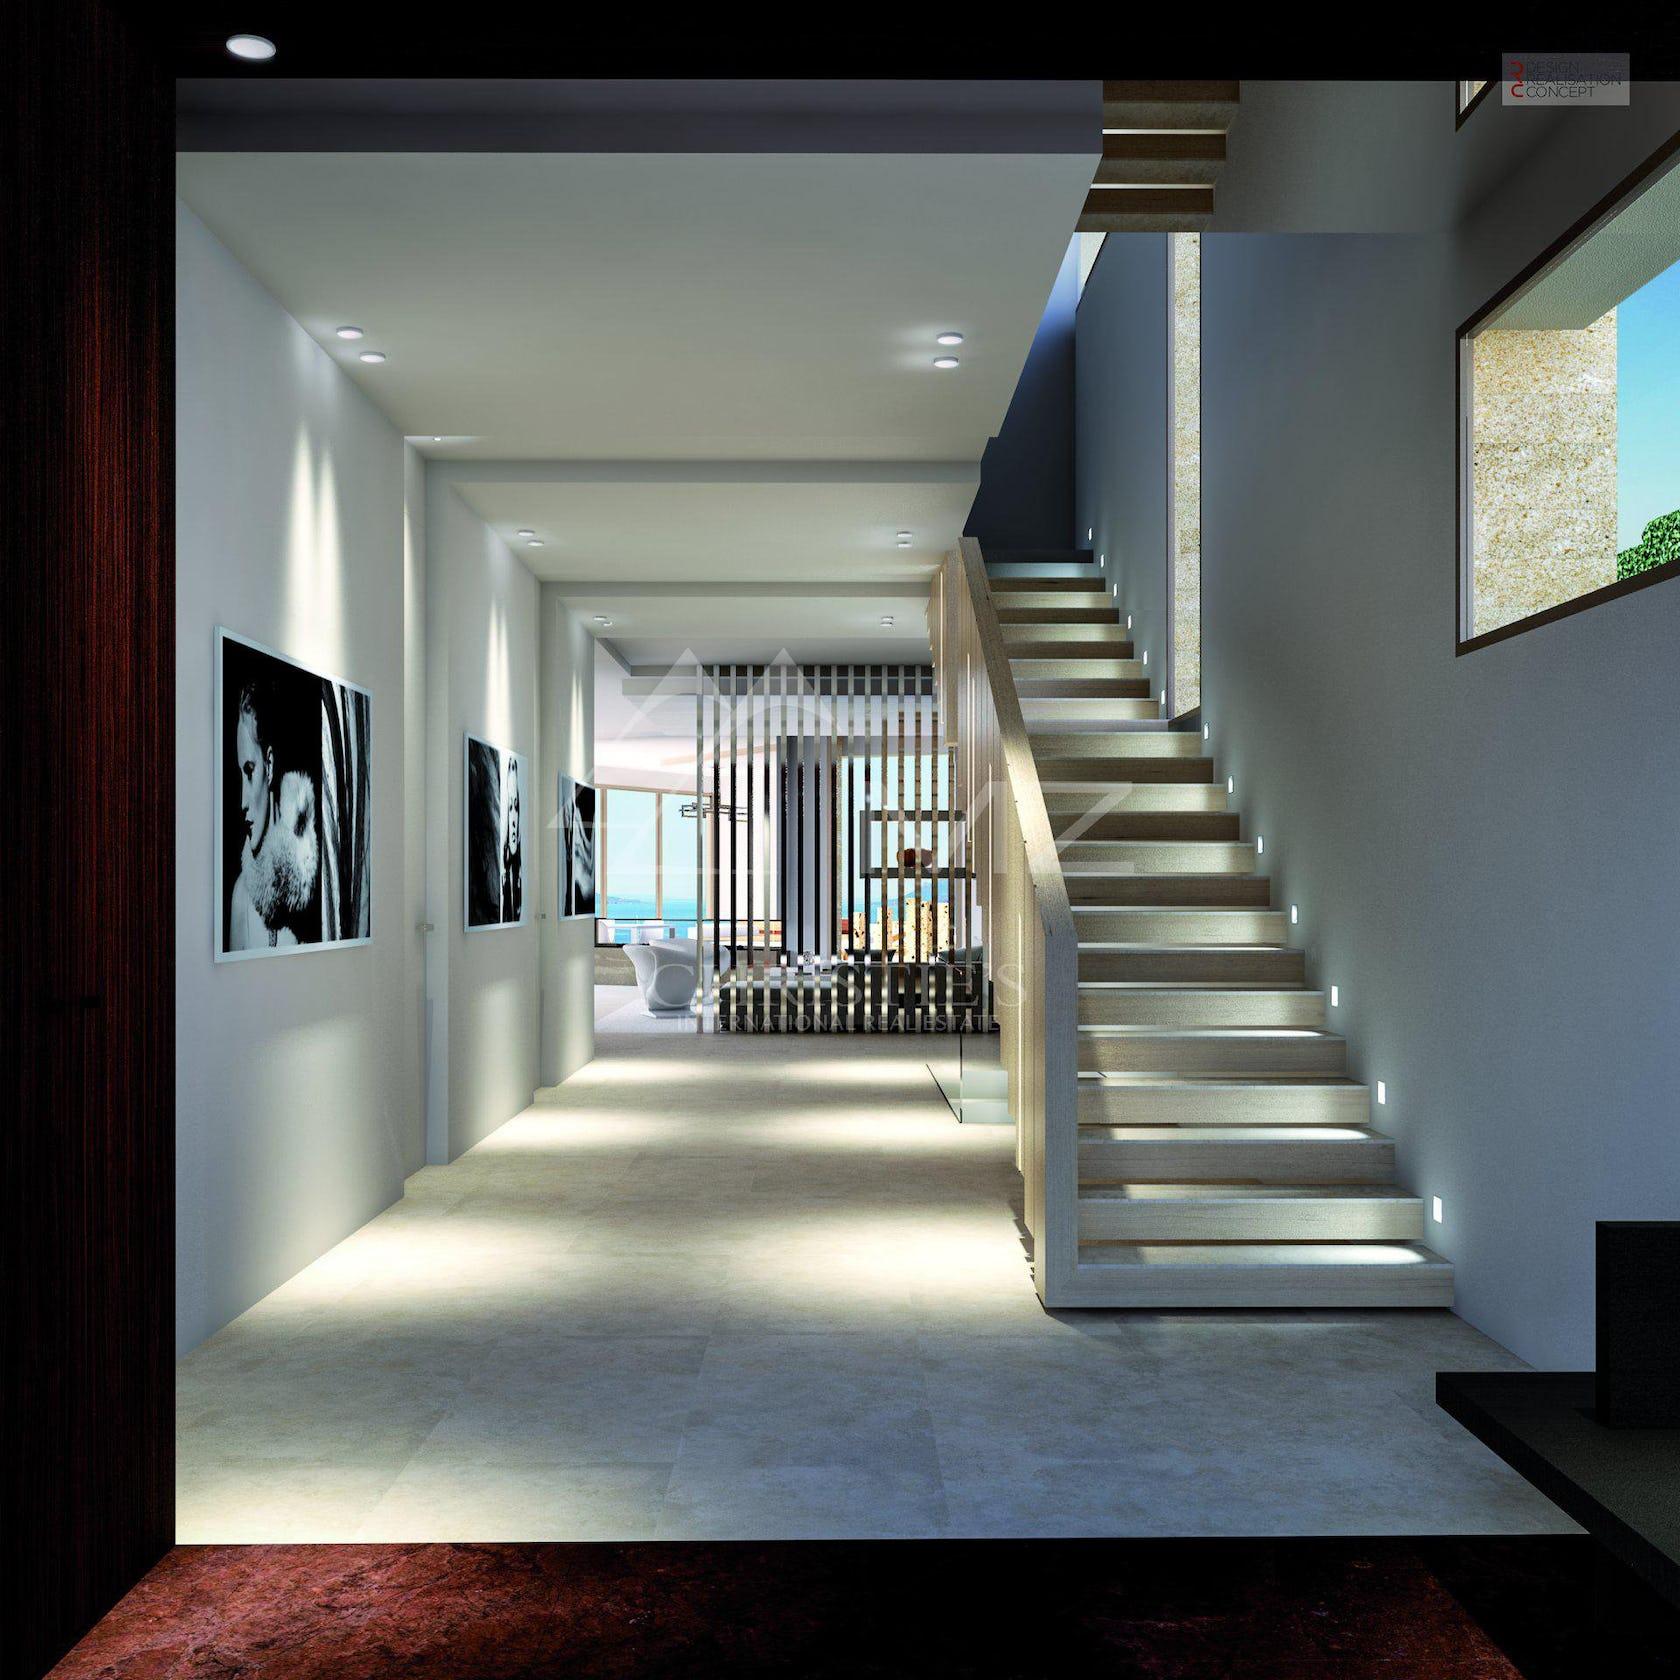 flooring floor corridor staircase interior design indoors